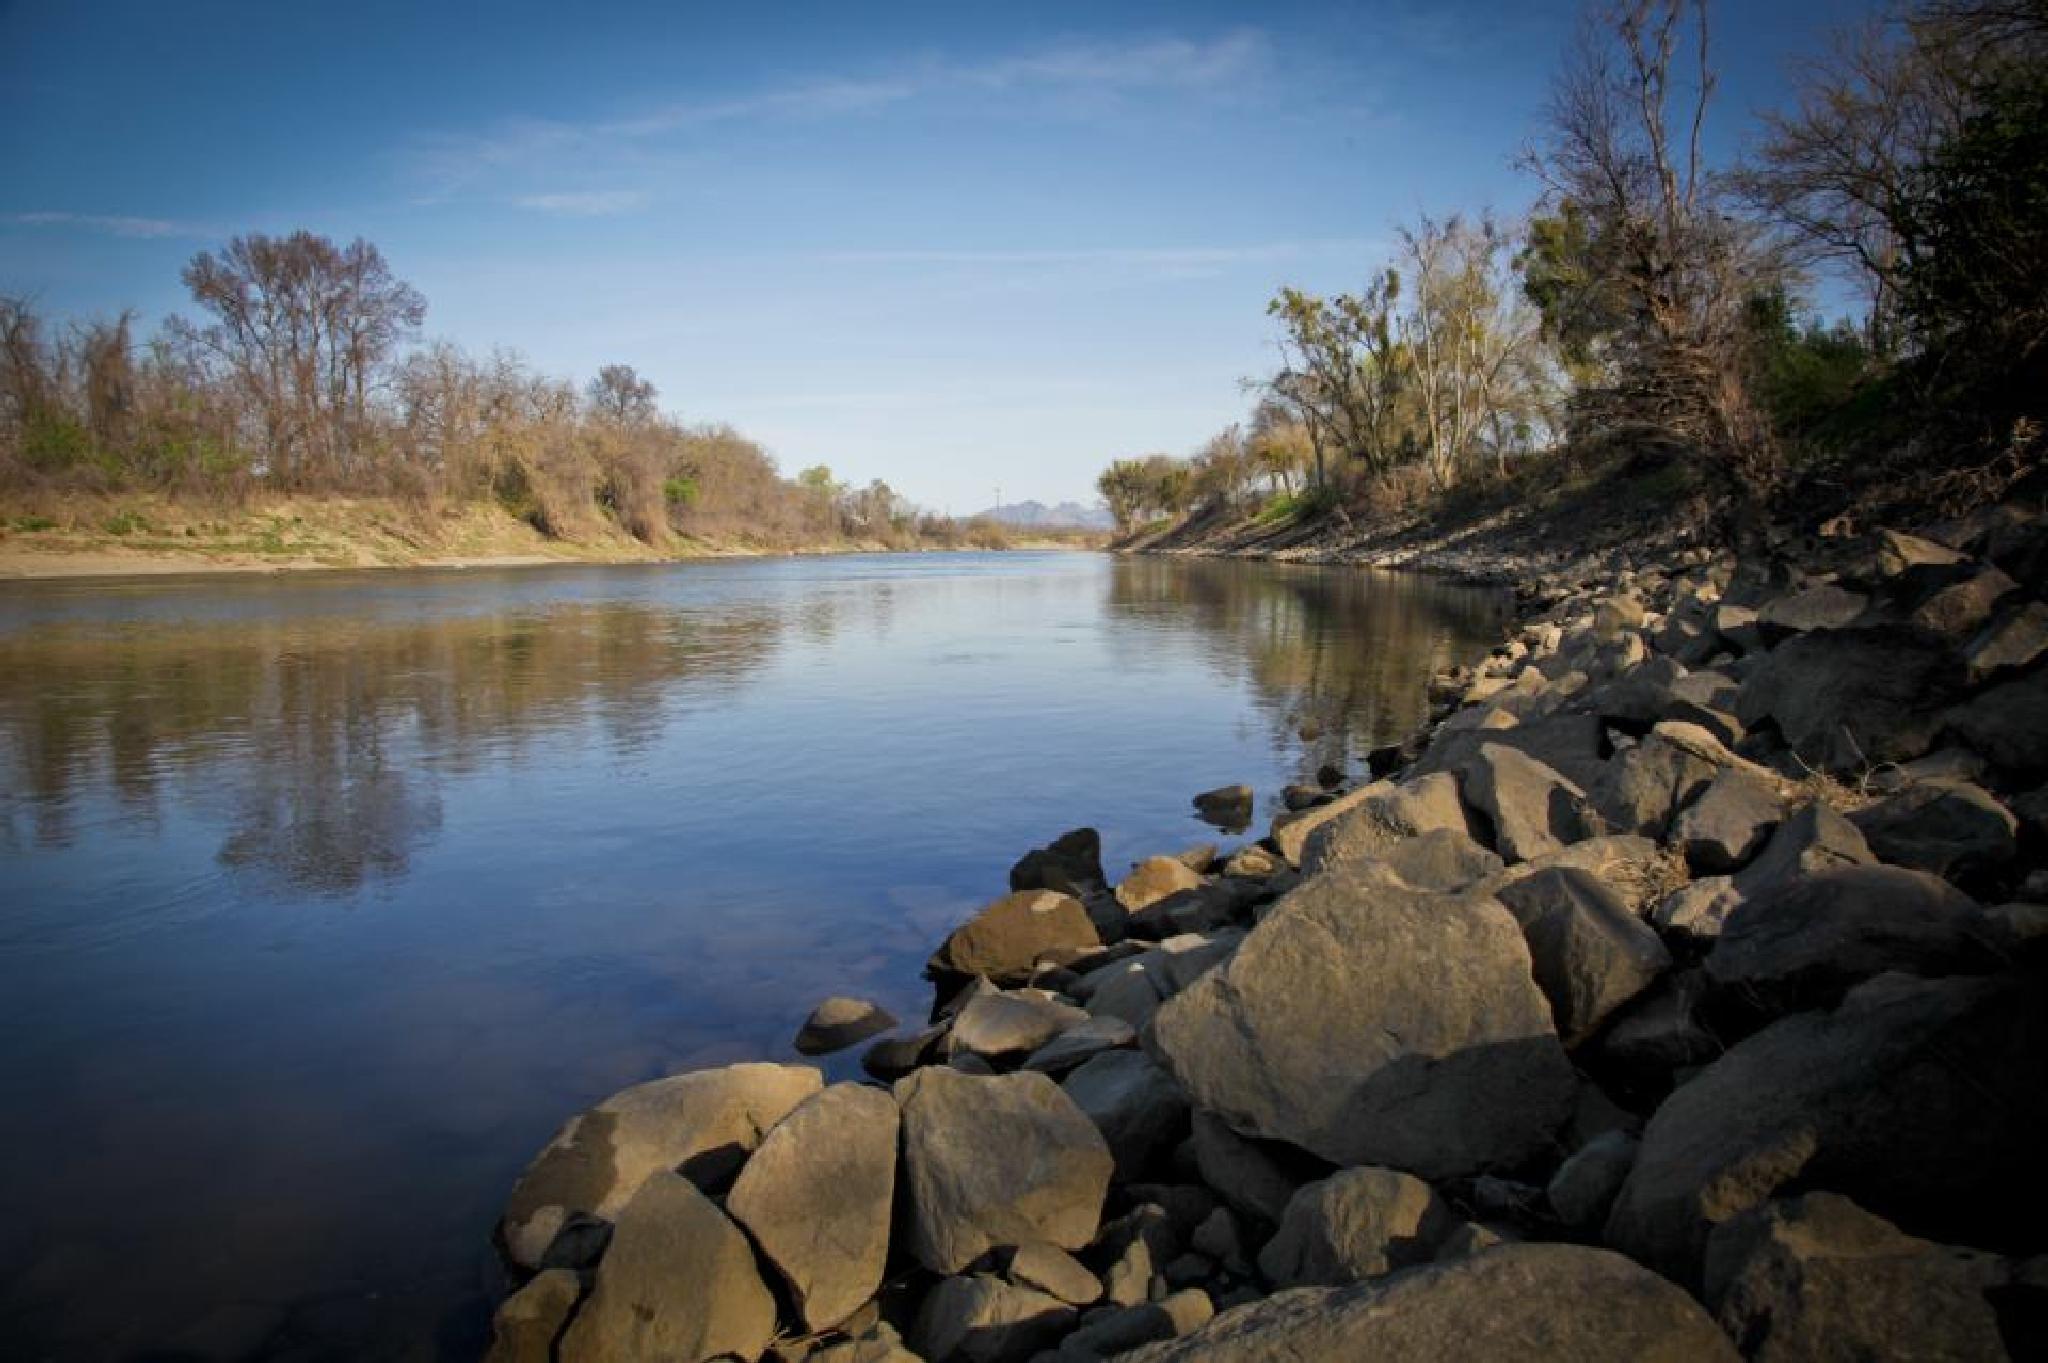 Sacramento River Calm by Elly Nicole